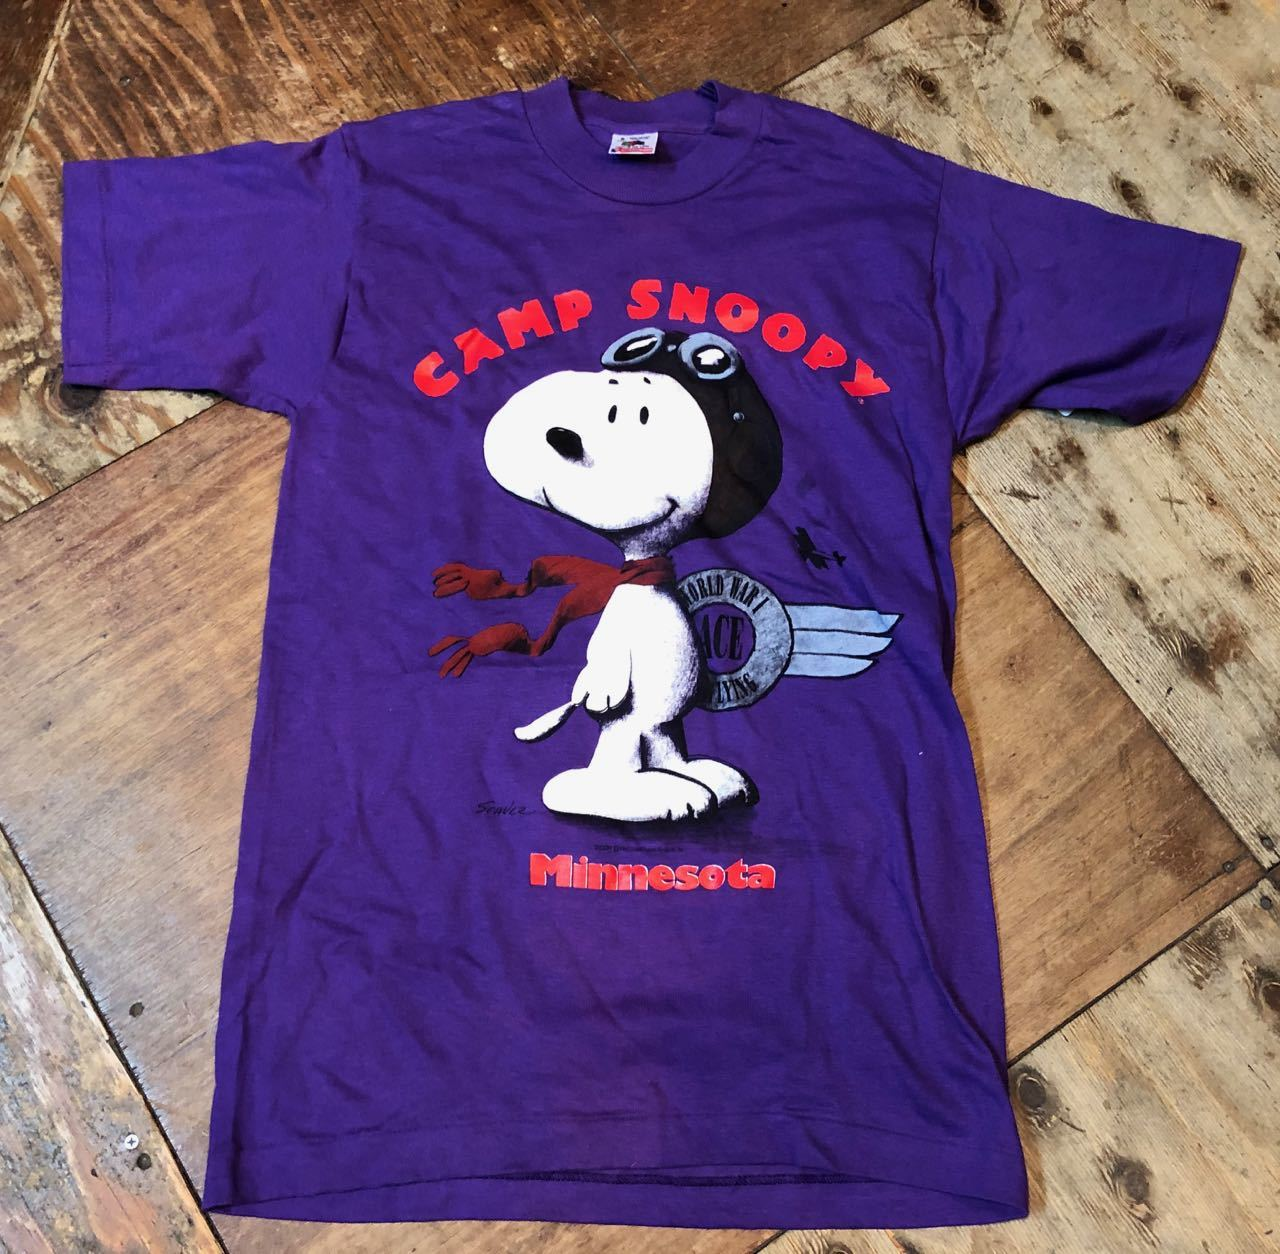 4月7日(日)入荷!90s MADE IN U.S.A  SNOOPY プリント! FRUIT OF THE LOOM Tシャツ! _c0144020_13100163.jpg